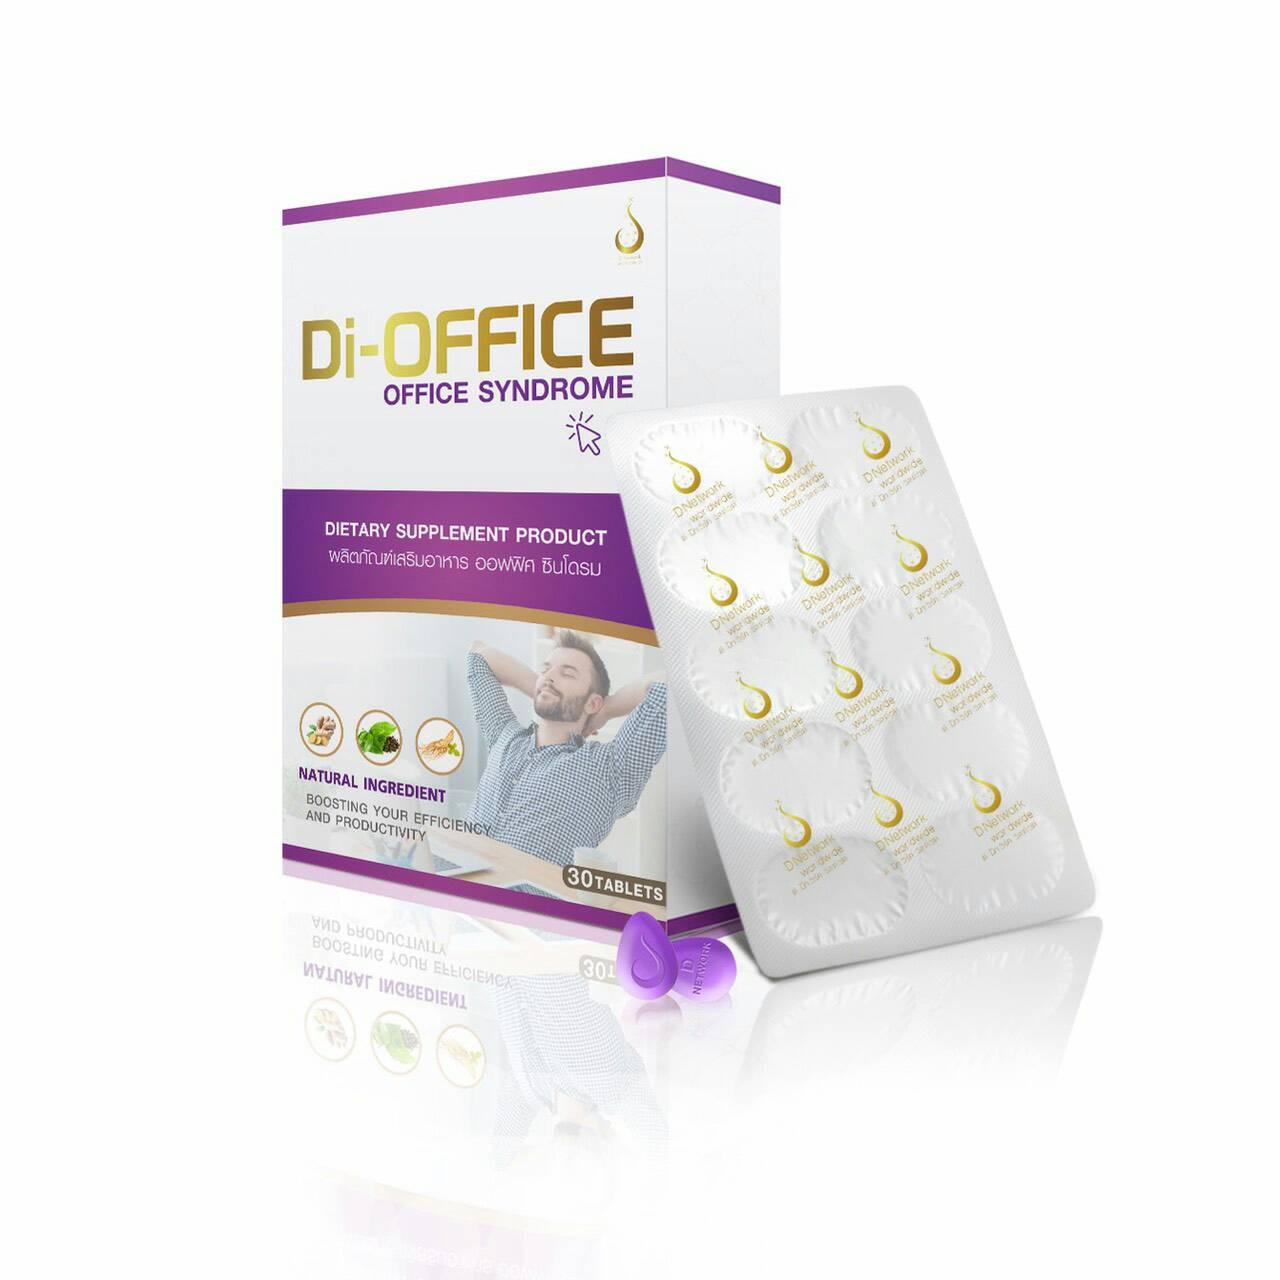 Di-Office ดีออฟฟิศ